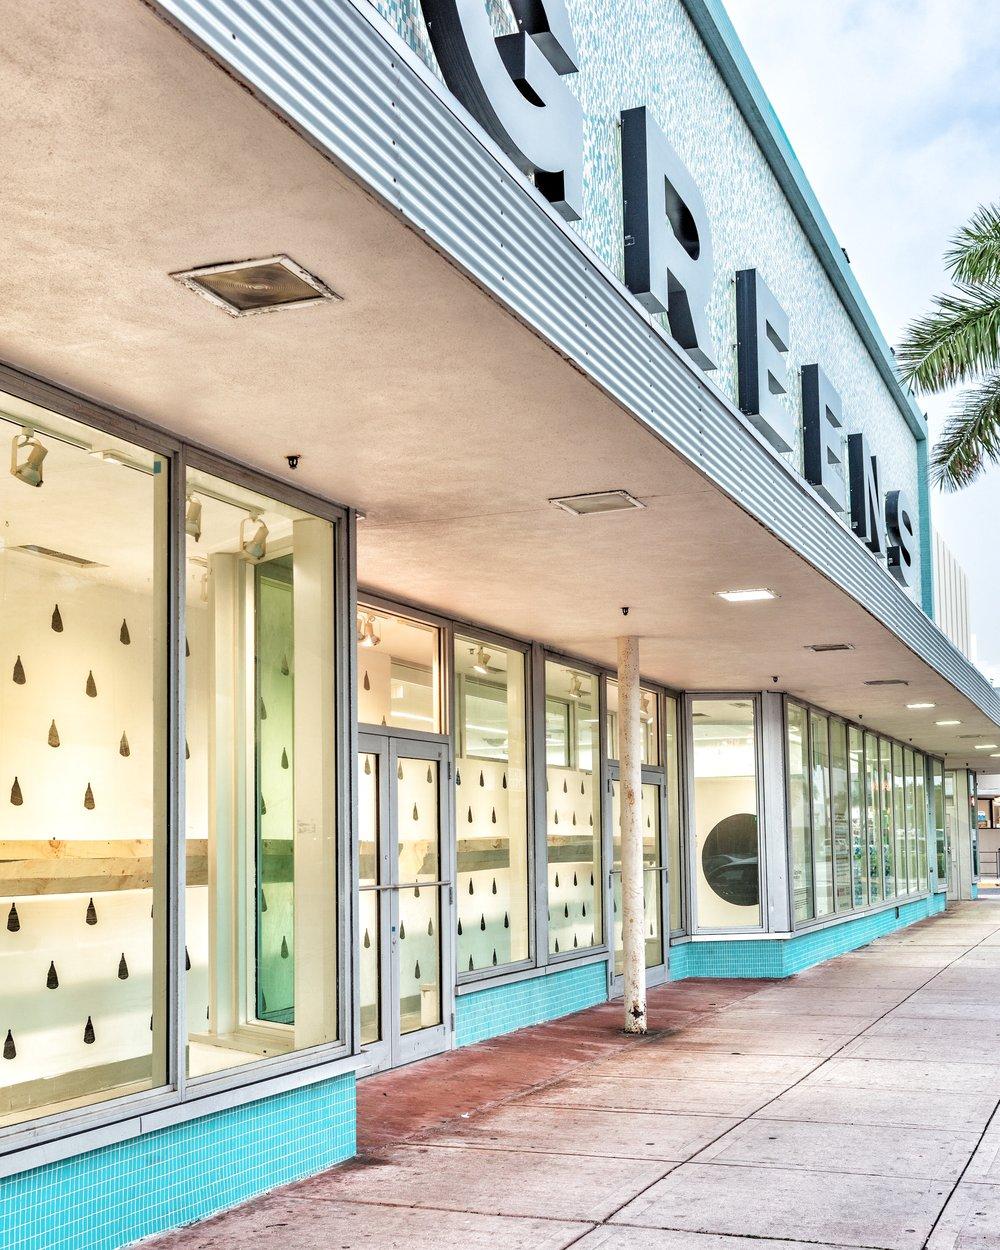 DRIFTING LINES installation. Miami Beach, Florida